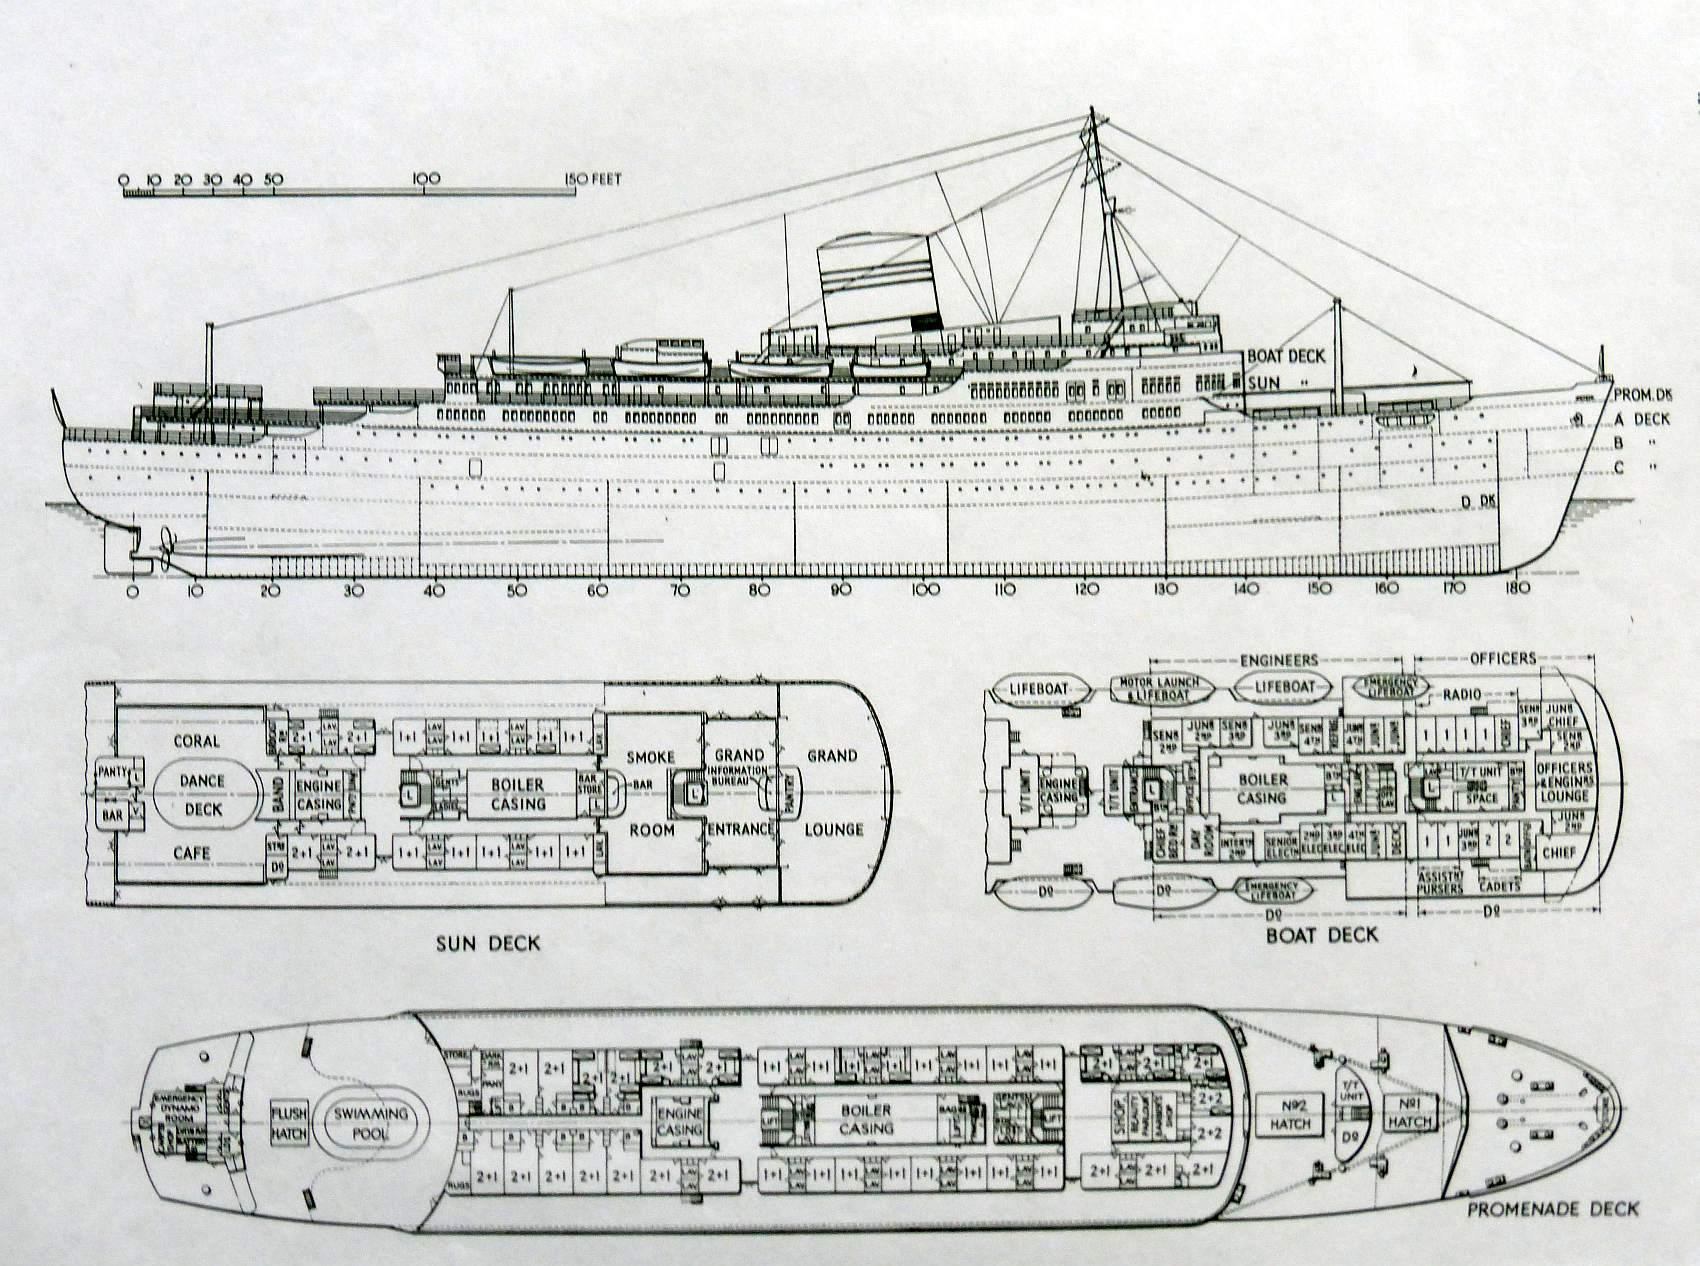 Container Ship Deck Plans : Ocean monarch